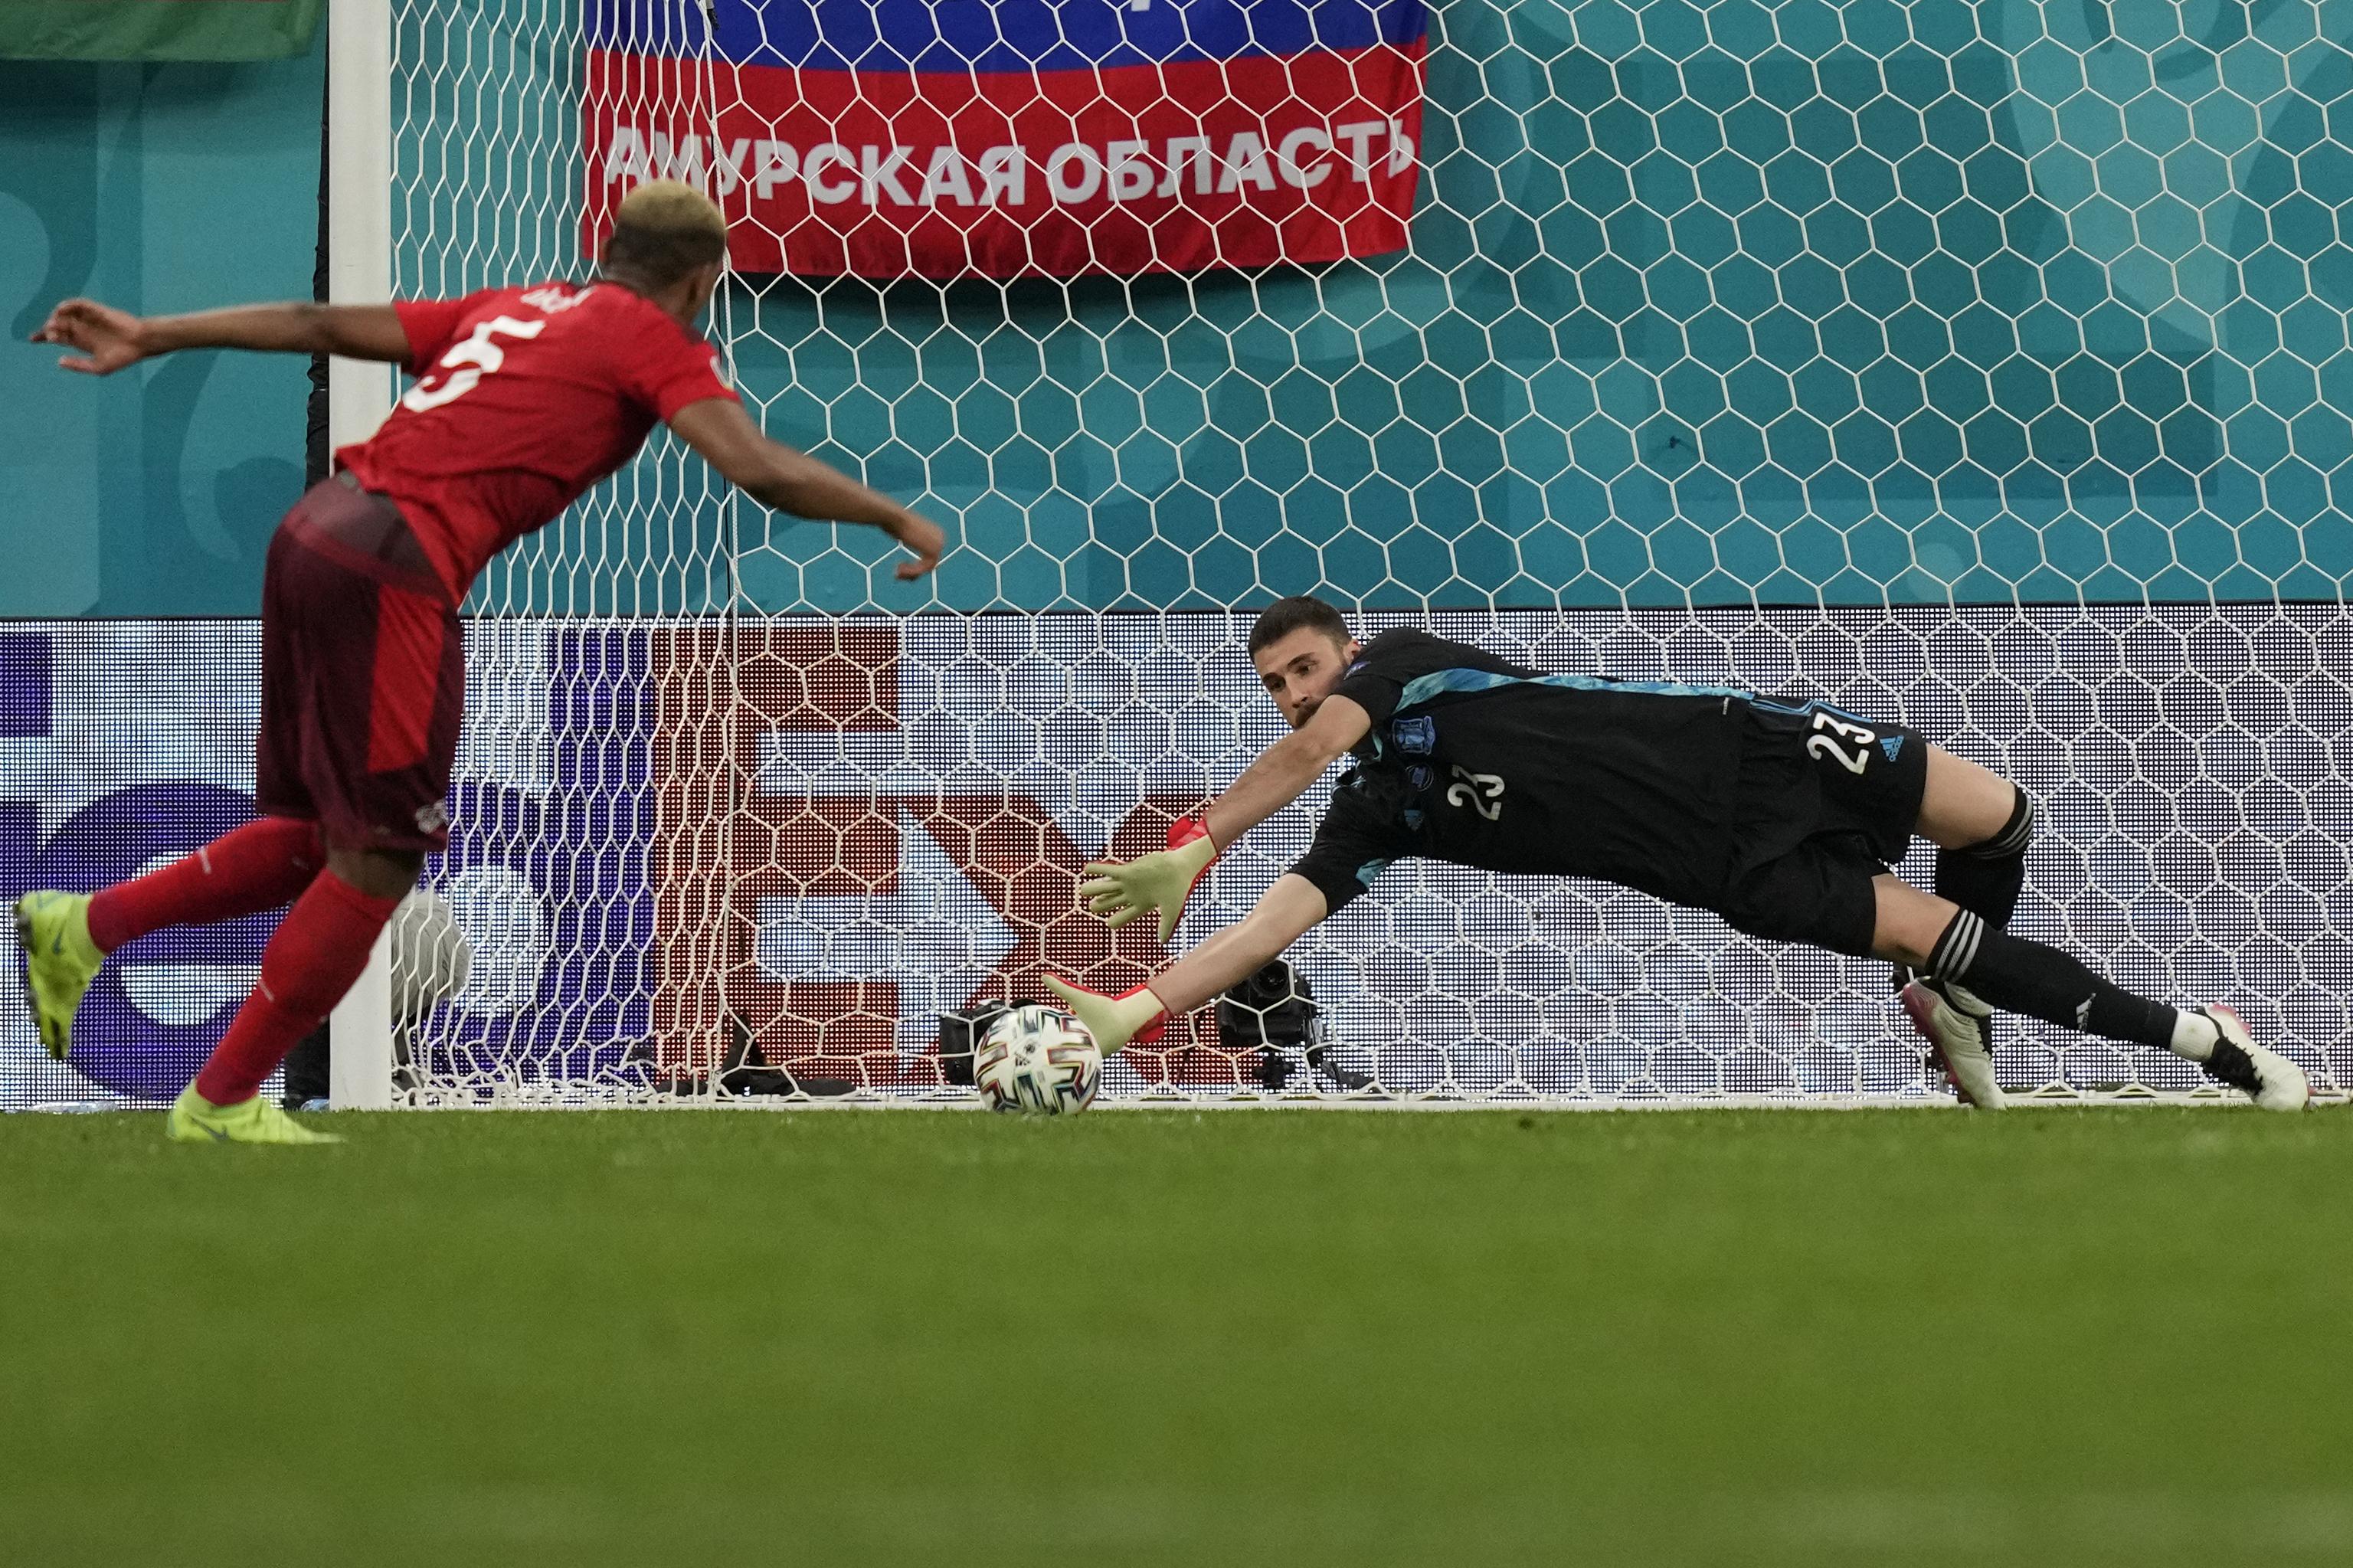 Unai Simón detiene el penalti a Manuel Akanji.